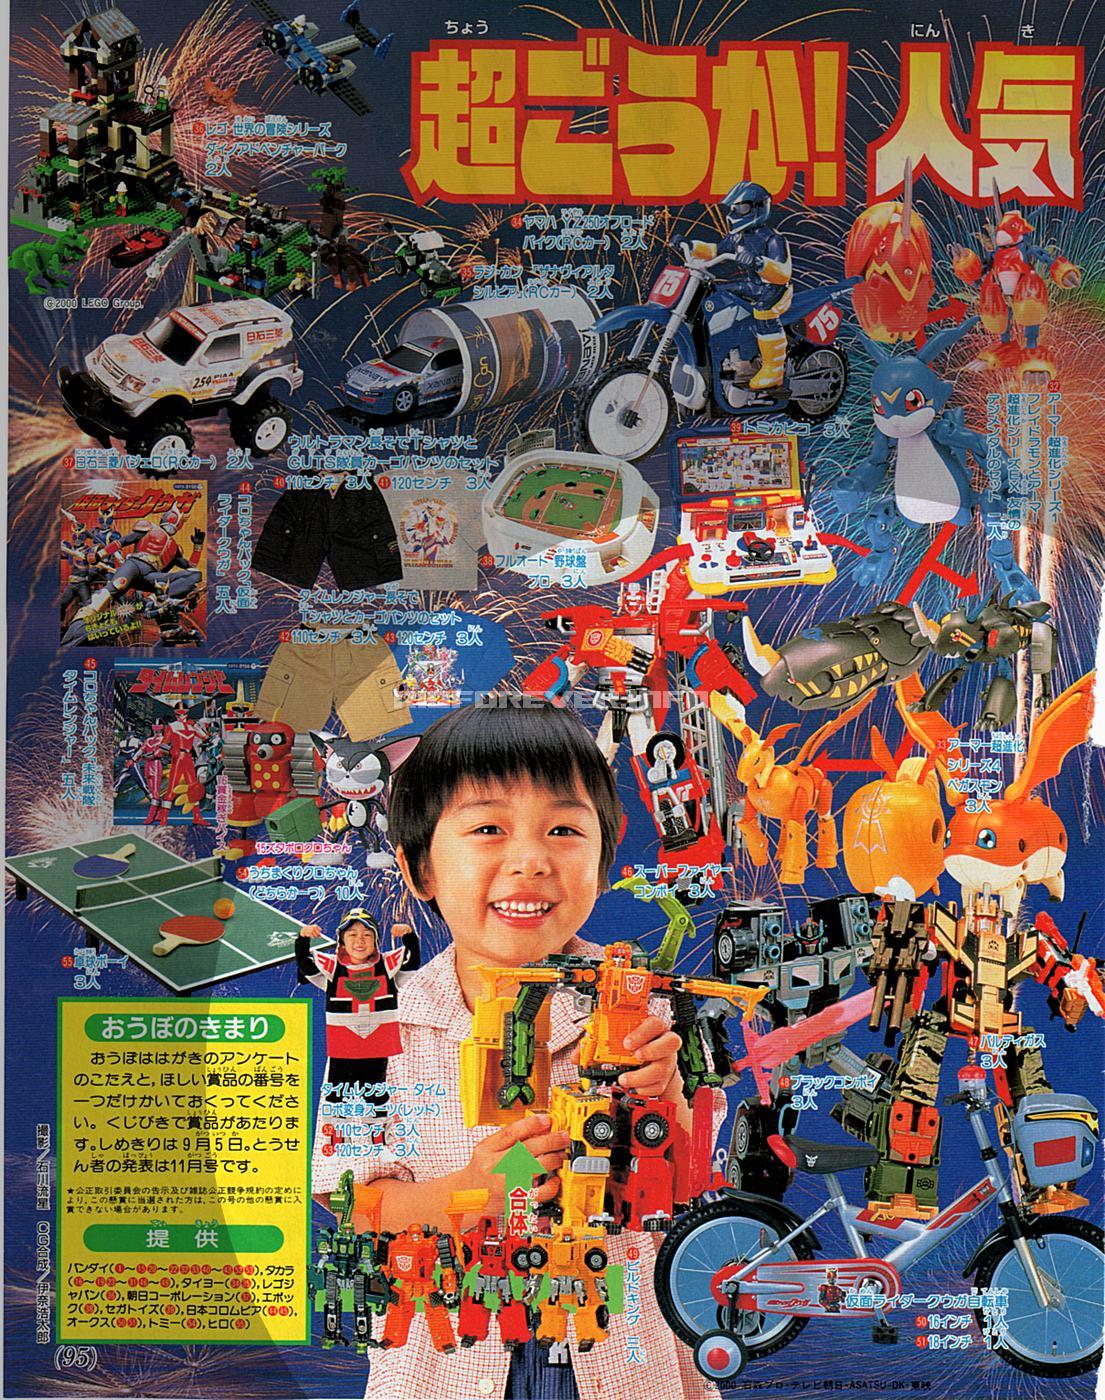 TV Magazine 2000-09-7